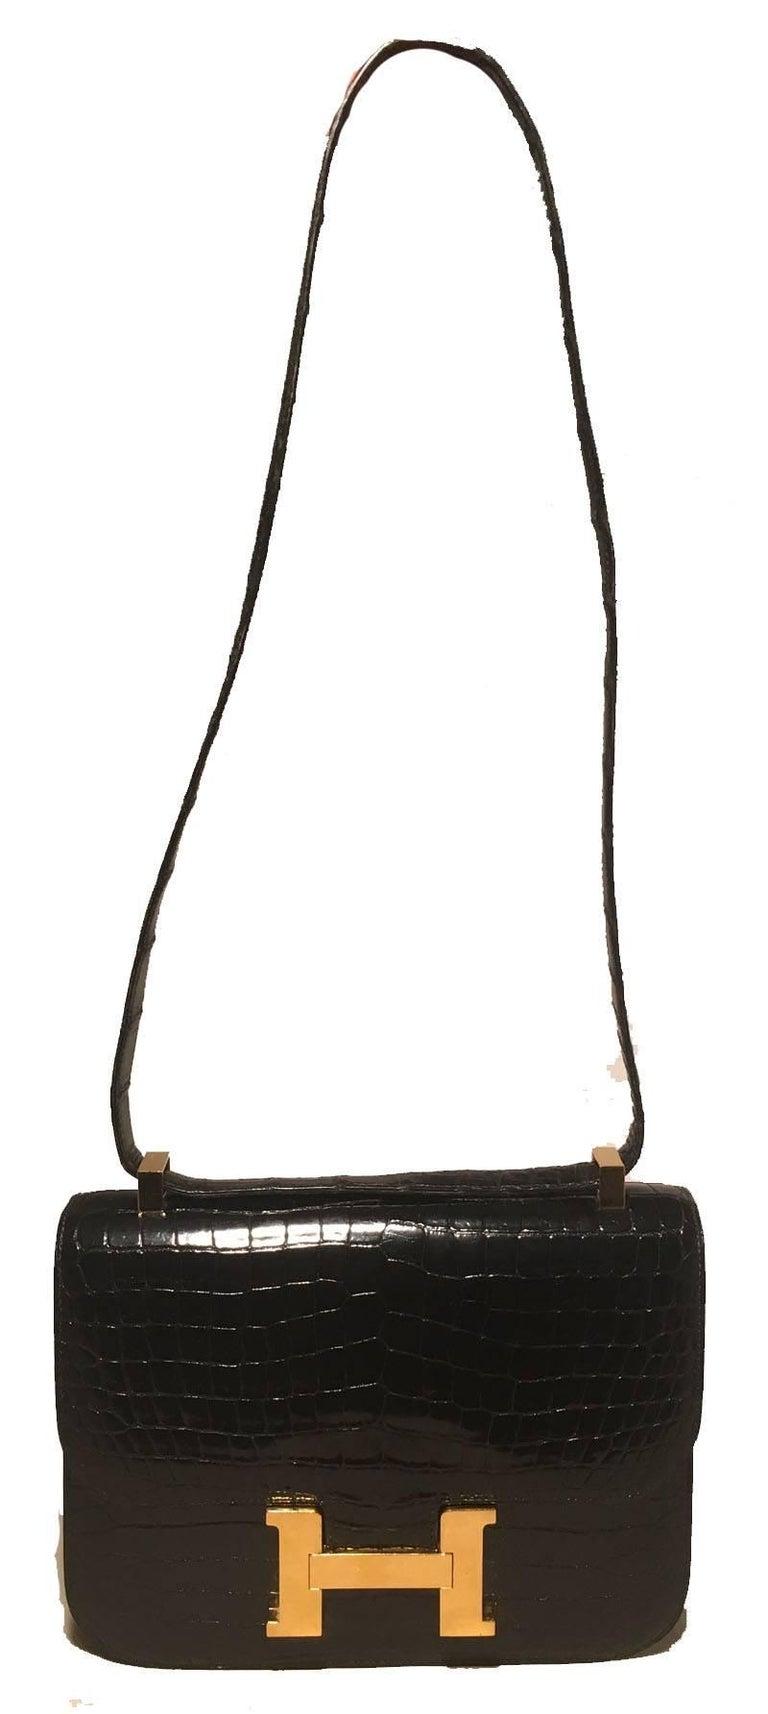 Hermes Black Crocodile Constance Shoulder Bag Rare In Good Condition For Sale In Philadelphia, PA